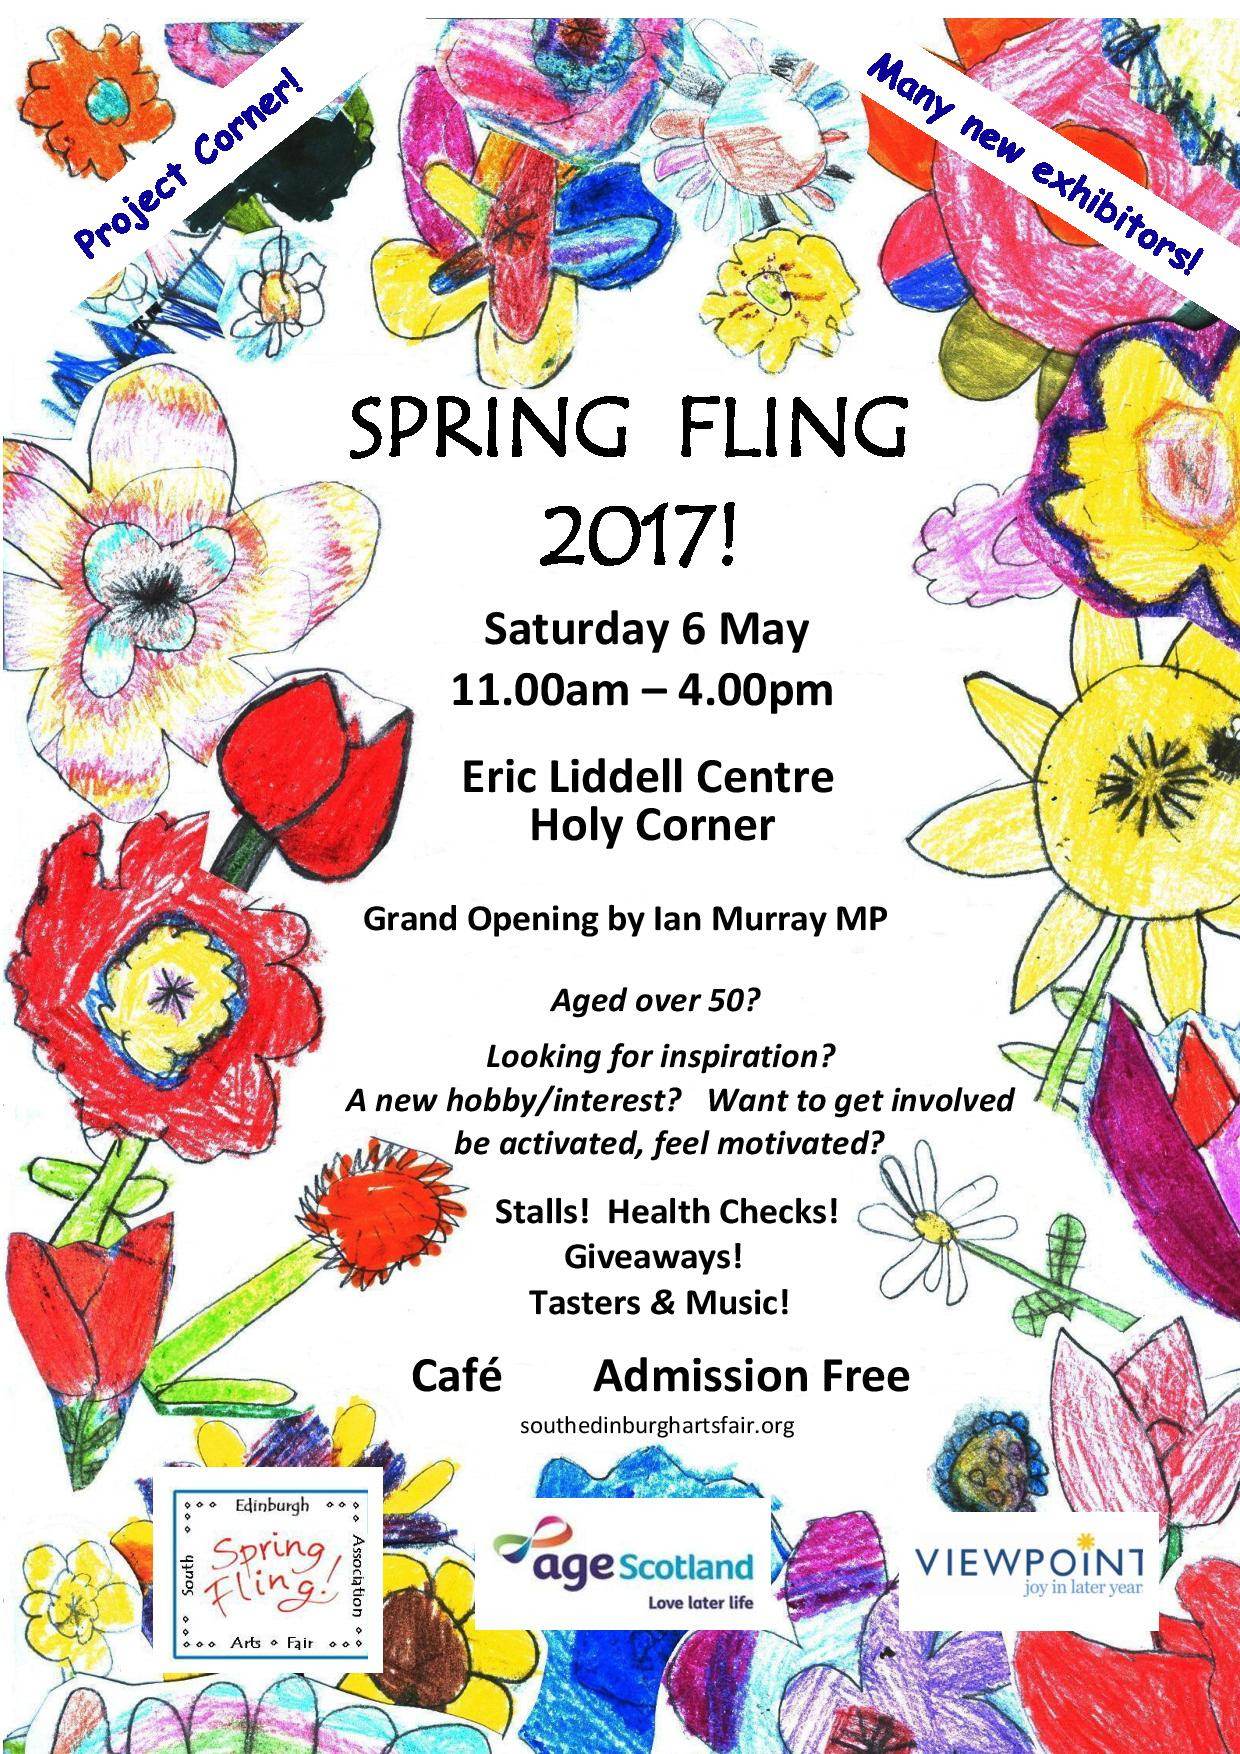 Spring_Fling_2017_Poster_Final-2-page-001.jpg